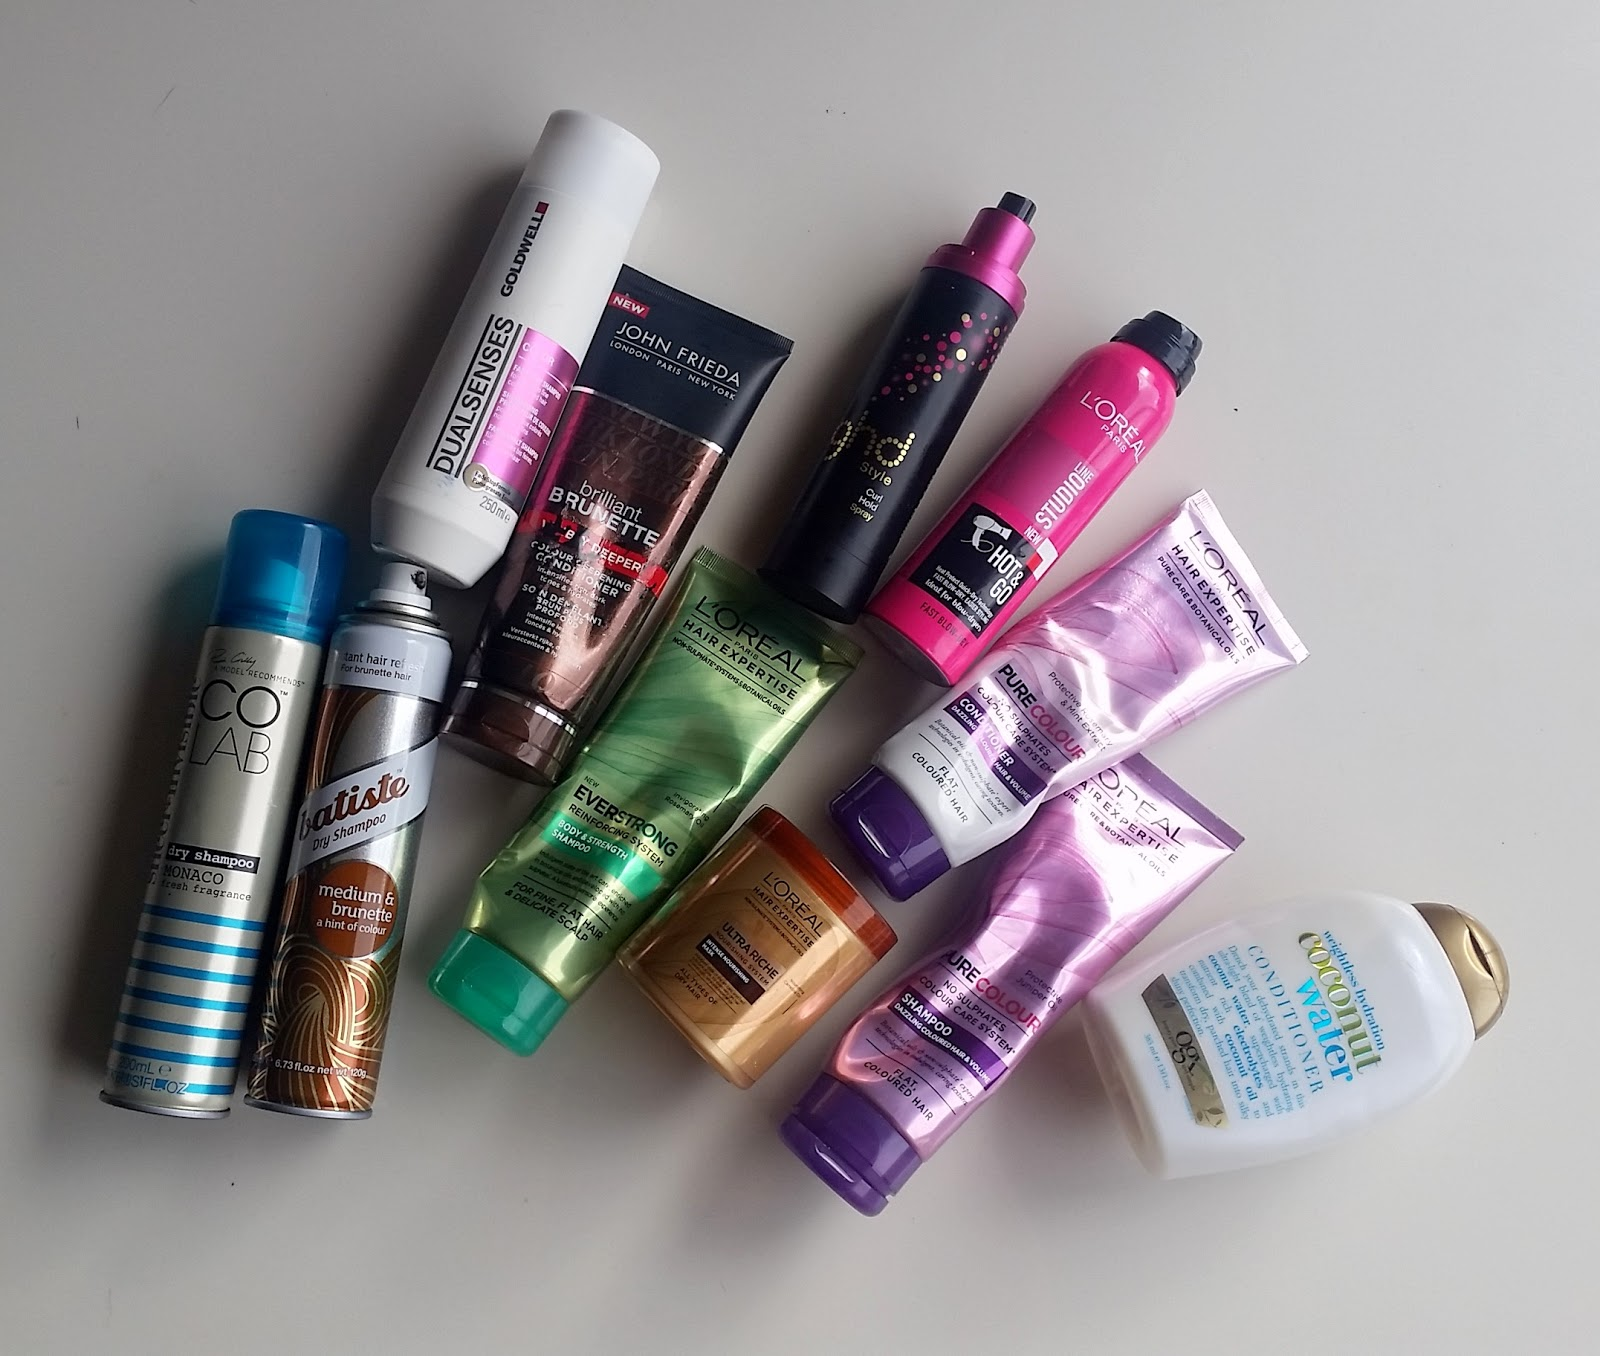 EMPTIES – Hair care, Sugar & Spice